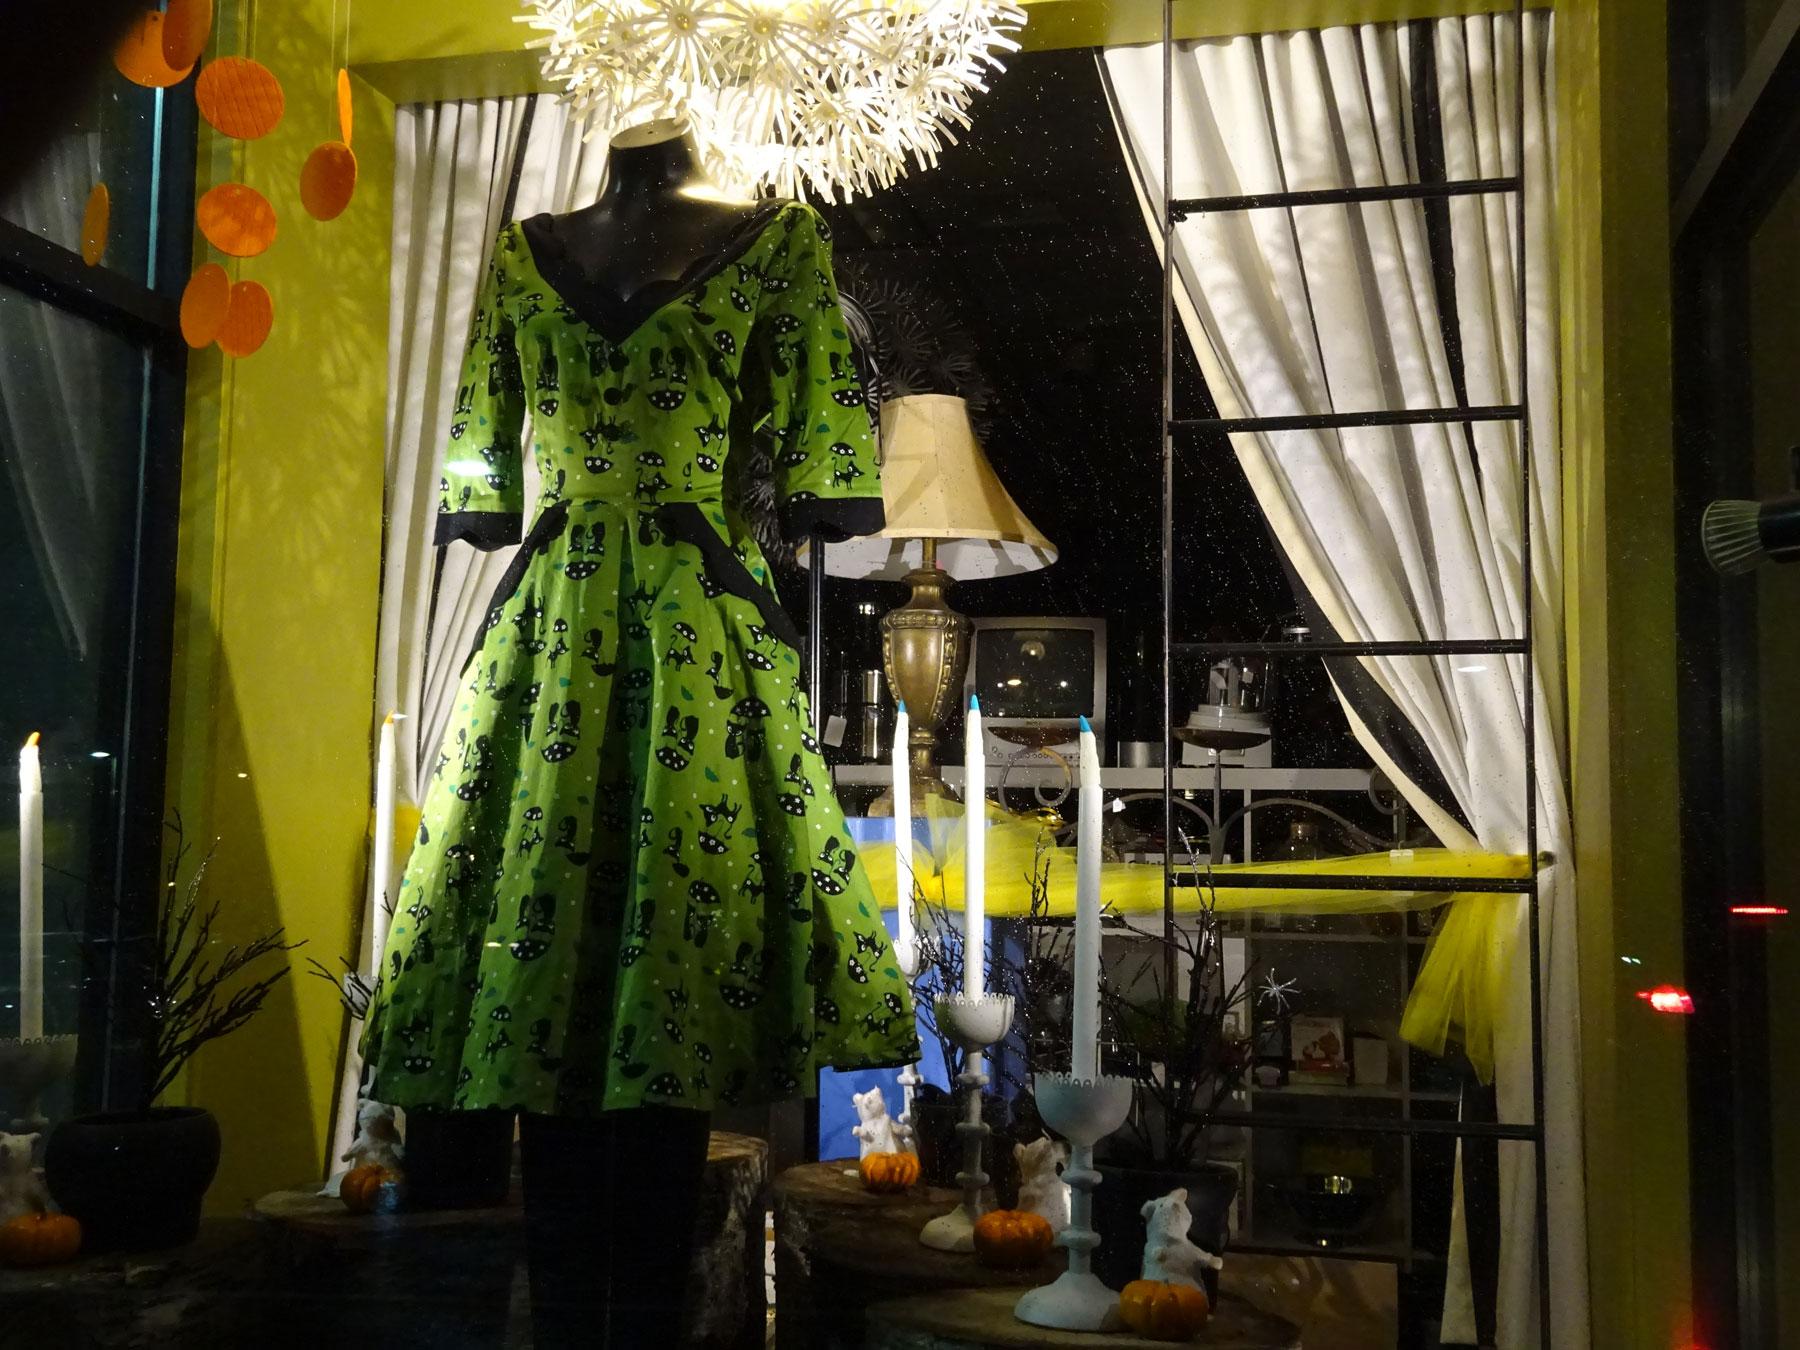 DSC00878-green-dress-1800x1350